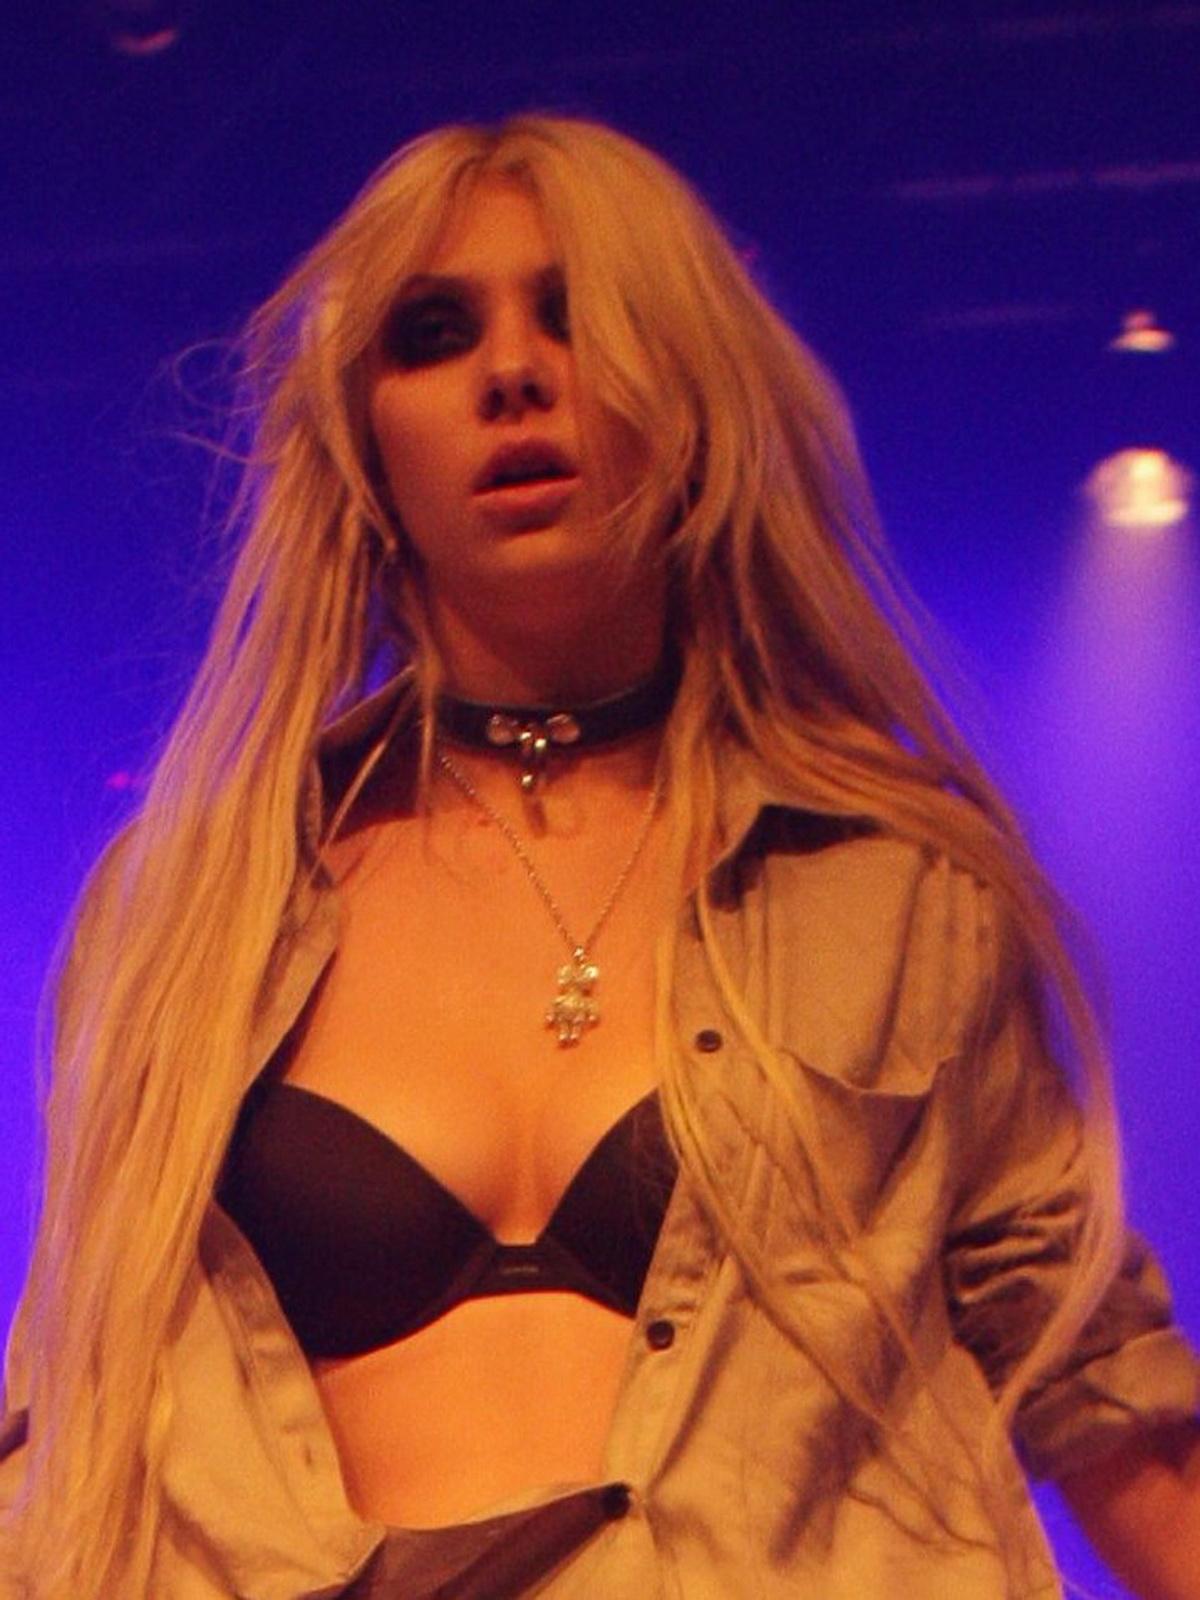 http://4.bp.blogspot.com/_NRGPIrDtEg8/TQsv3NexNnI/AAAAAAAAAbE/0ZqiAIYhN1k/s1600/Taylor_Momsen_cleavage_2.jpg